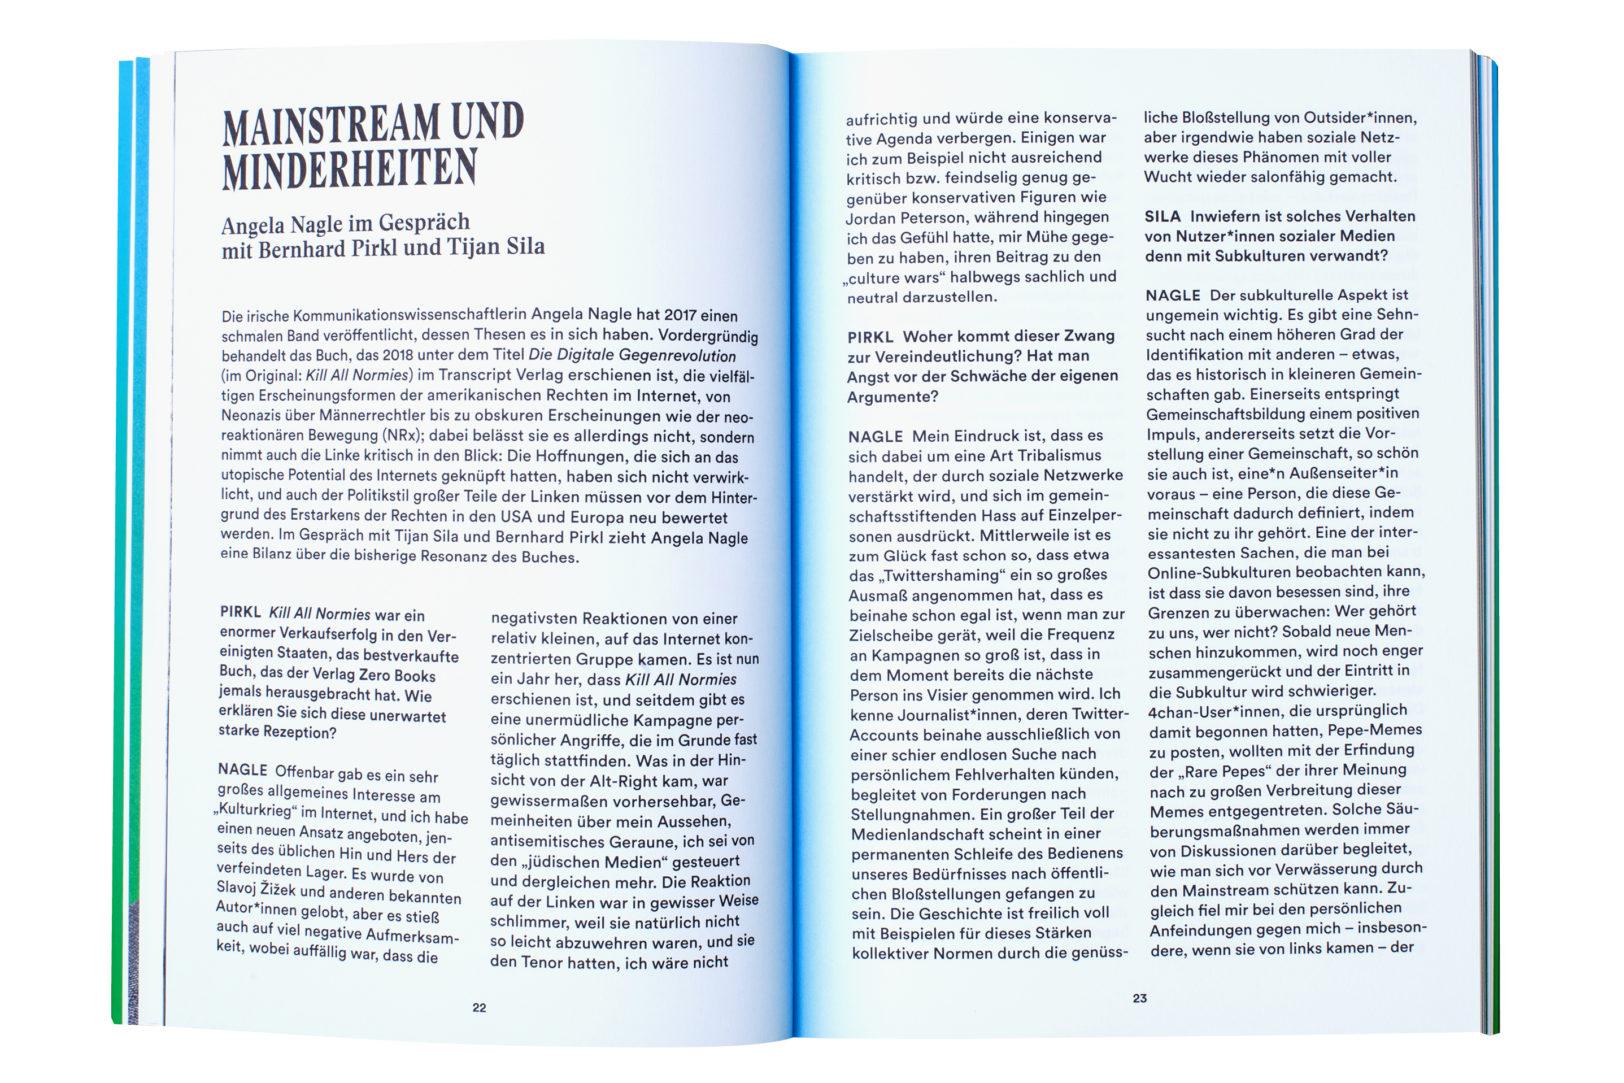 http://e-o-t.de/wordpress/wp-content/uploads/2019/04/eot-books-AltRight-63.jpg